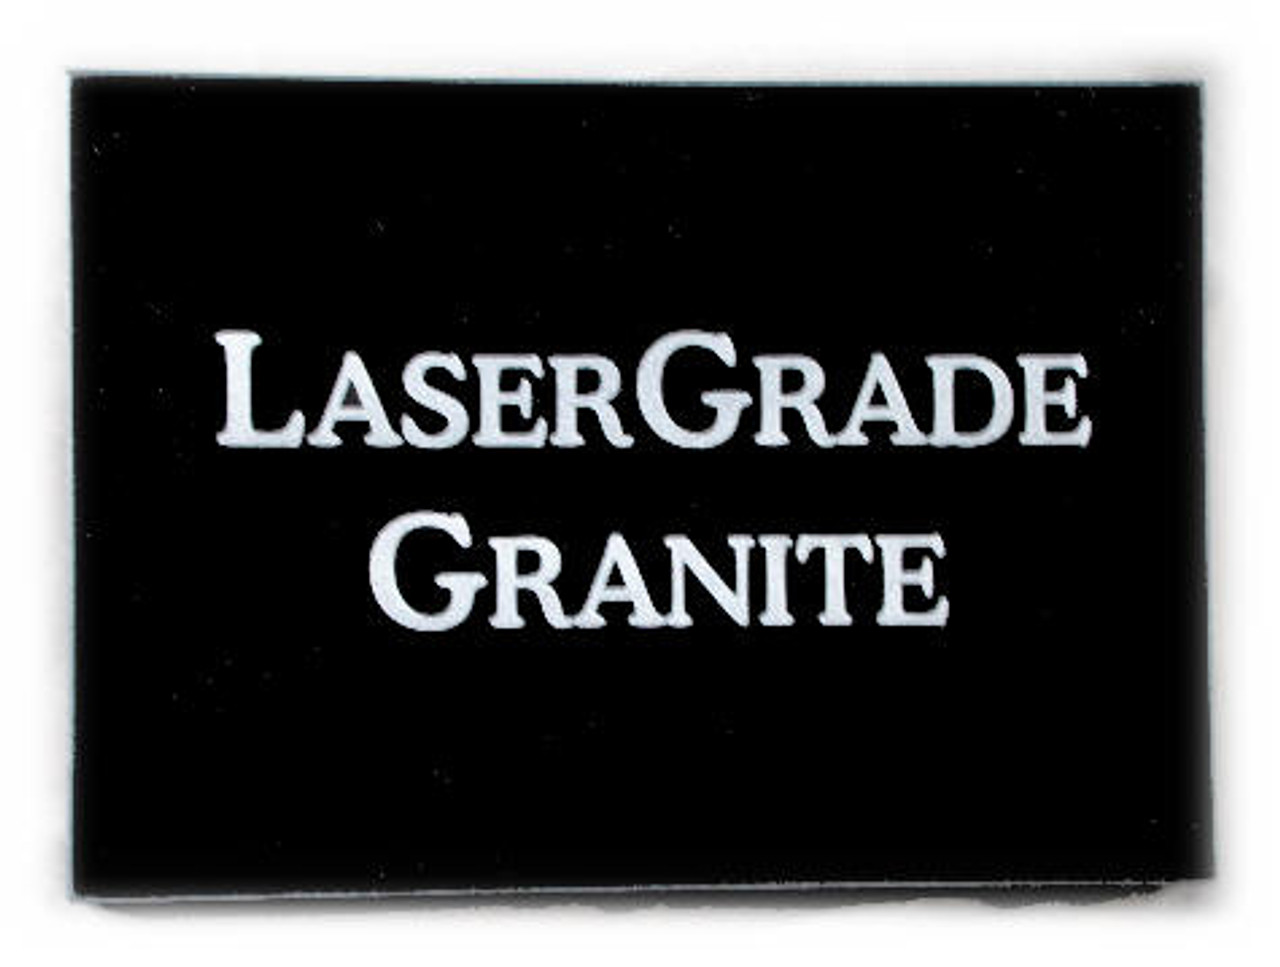 "G-MB-12 x 24 EP, LaserGrade, MB Black Granite, 12"" x 24"" x 7-8mm"" , Edges Polished, (5 face polished)"